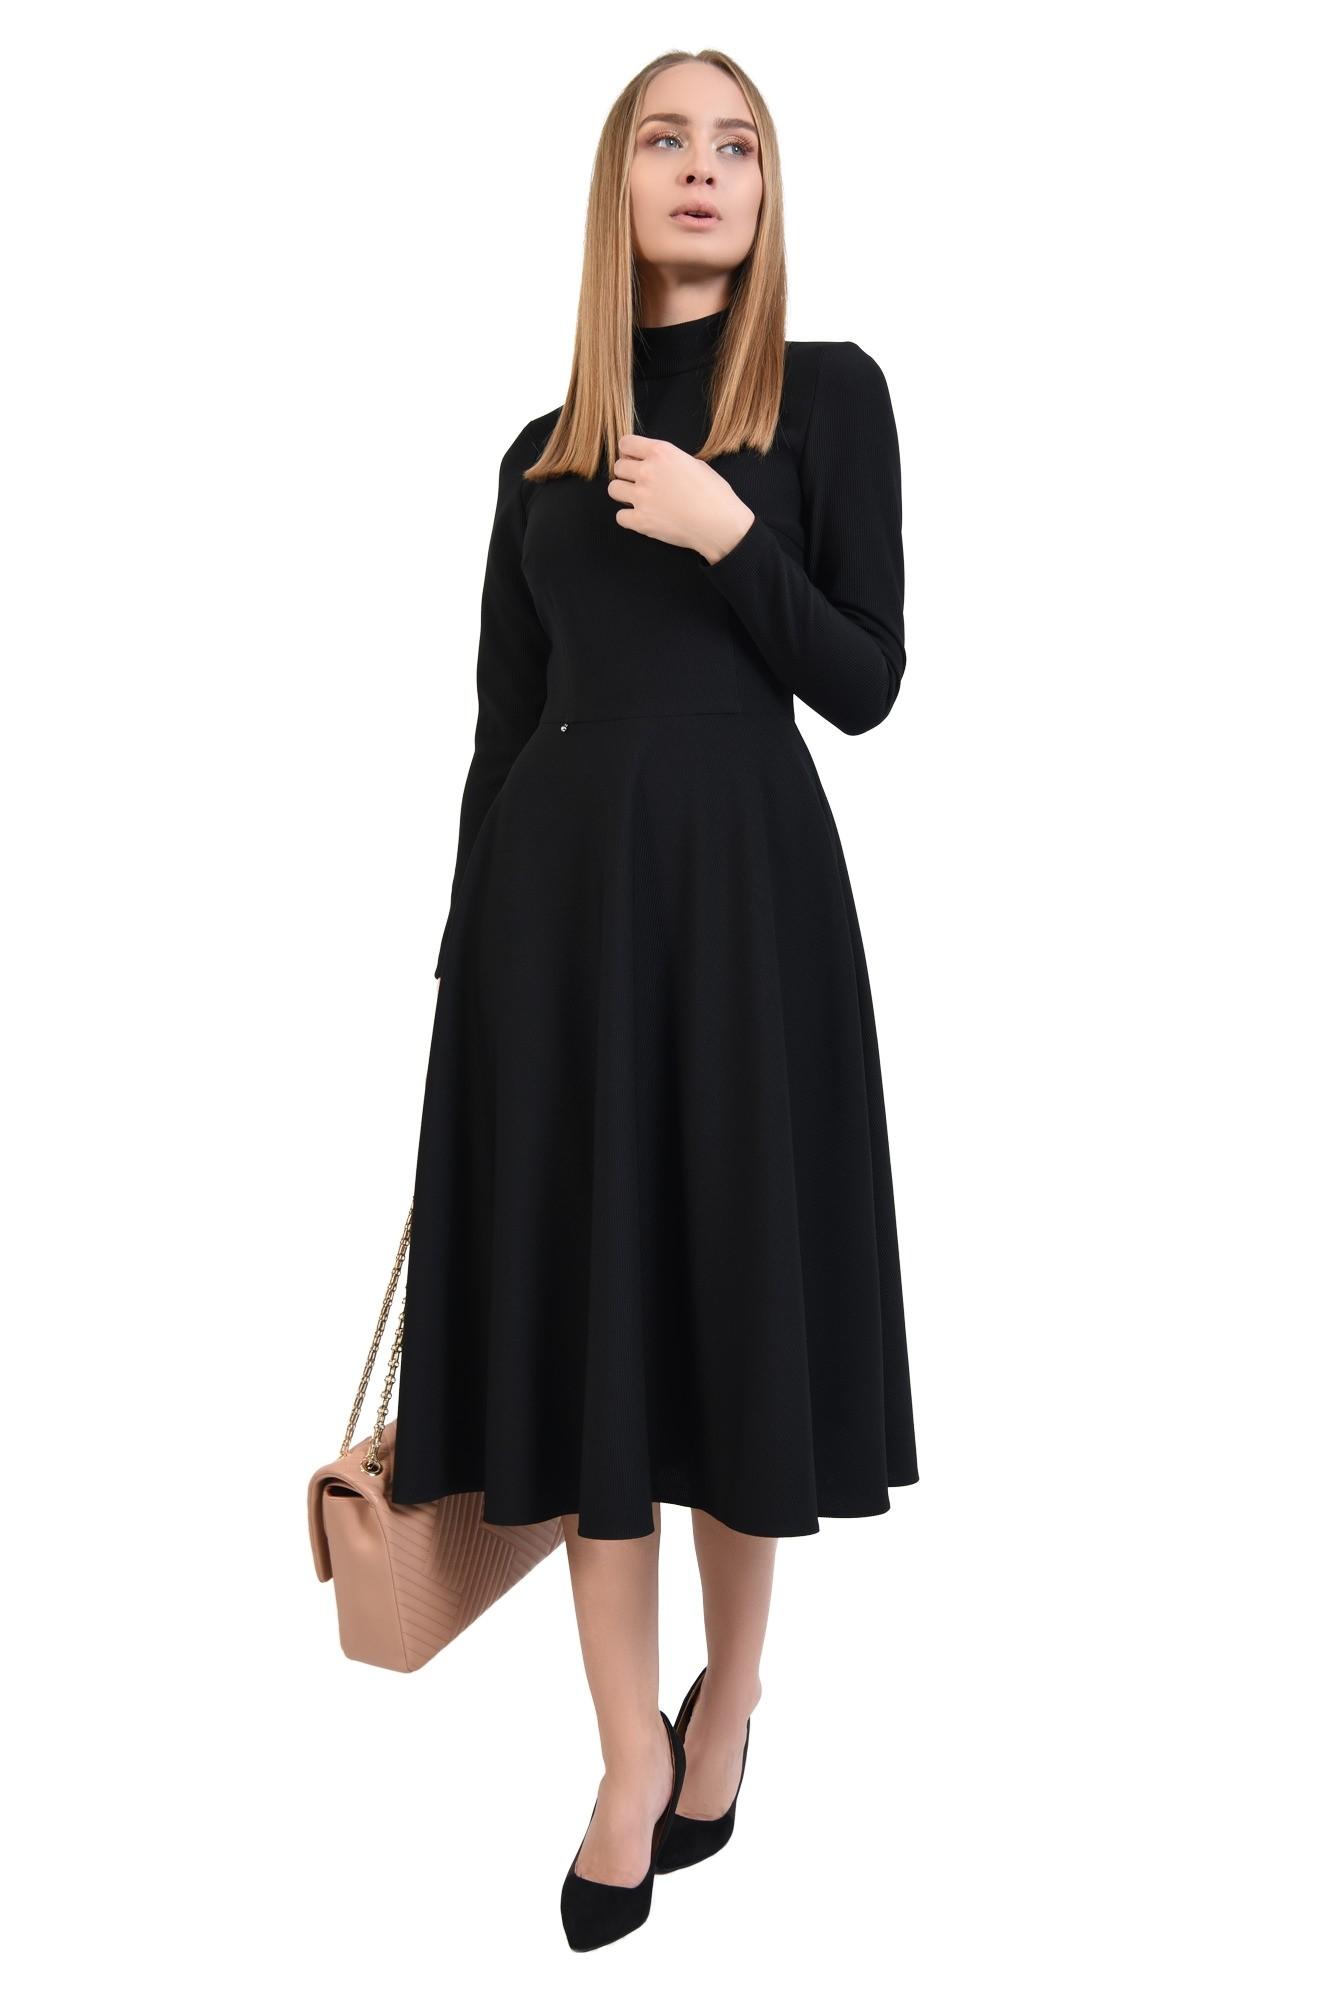 0 - rochie casual, neagra, evazata, nasturi la spate, guler inalt